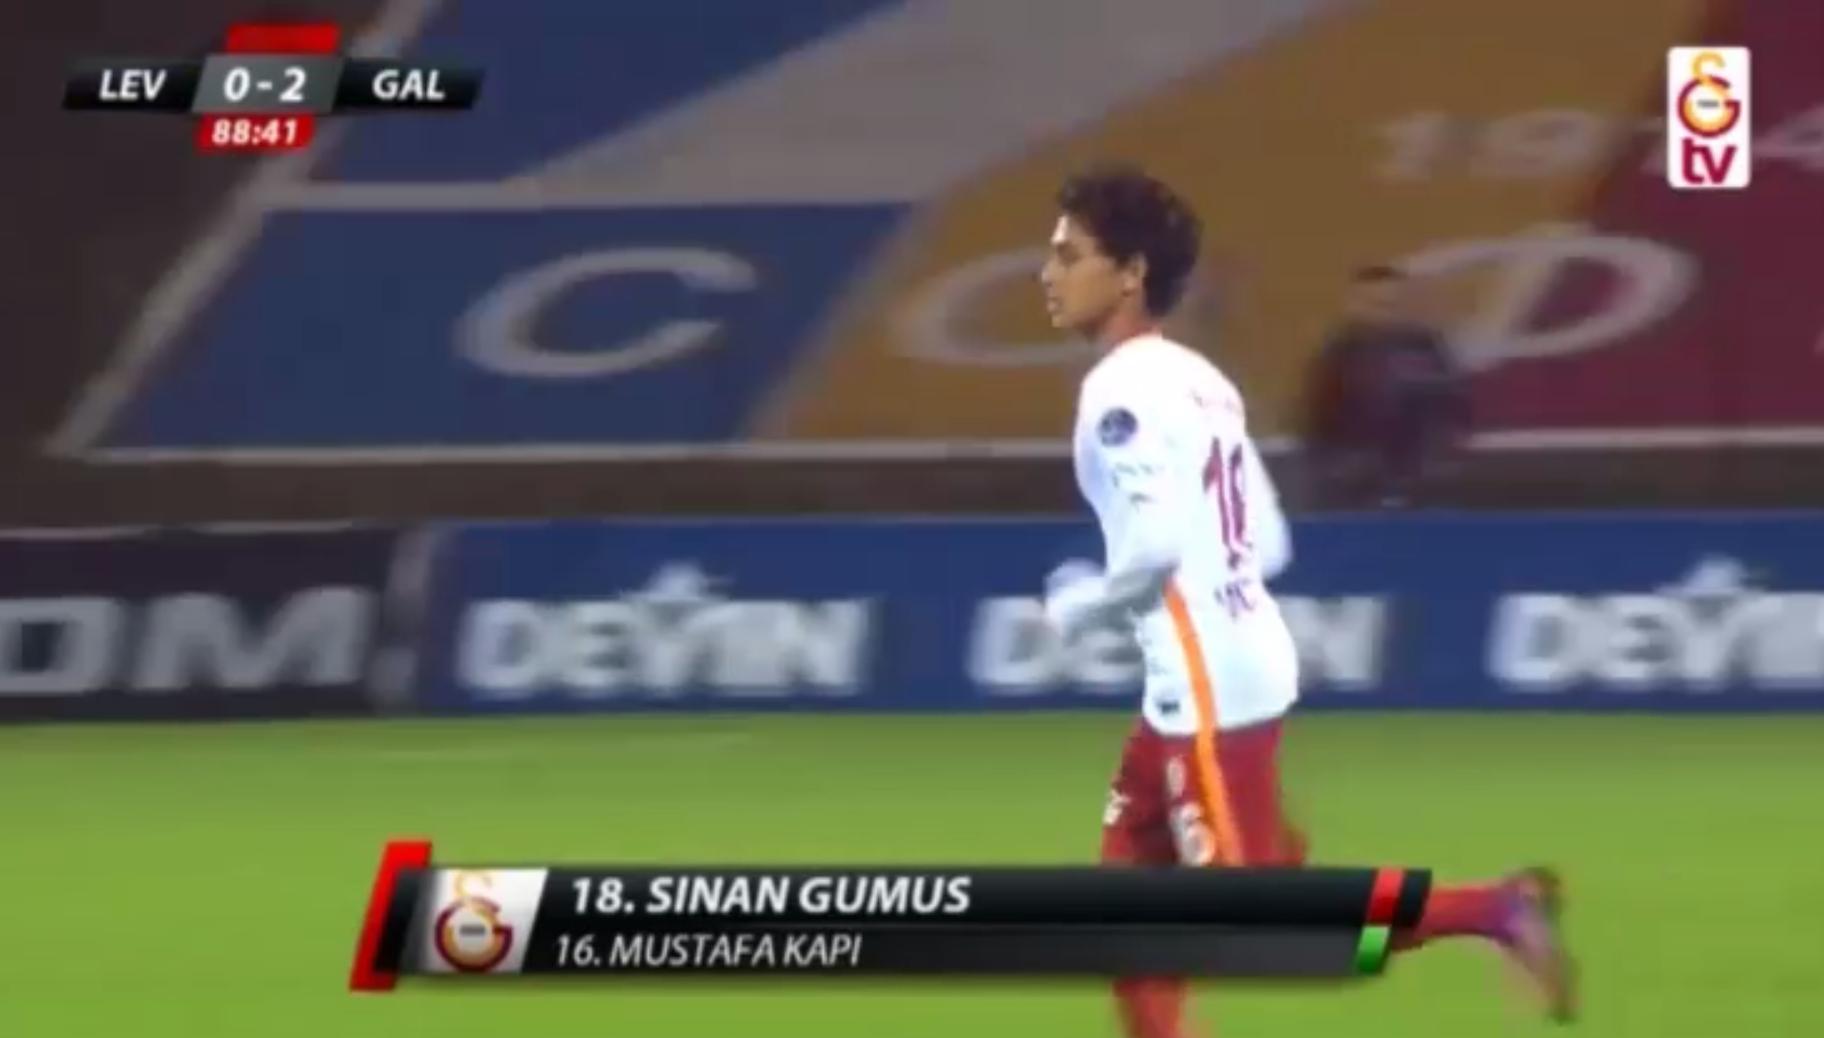 Football - Etranger - Les débuts de Kapi... à 14 ans